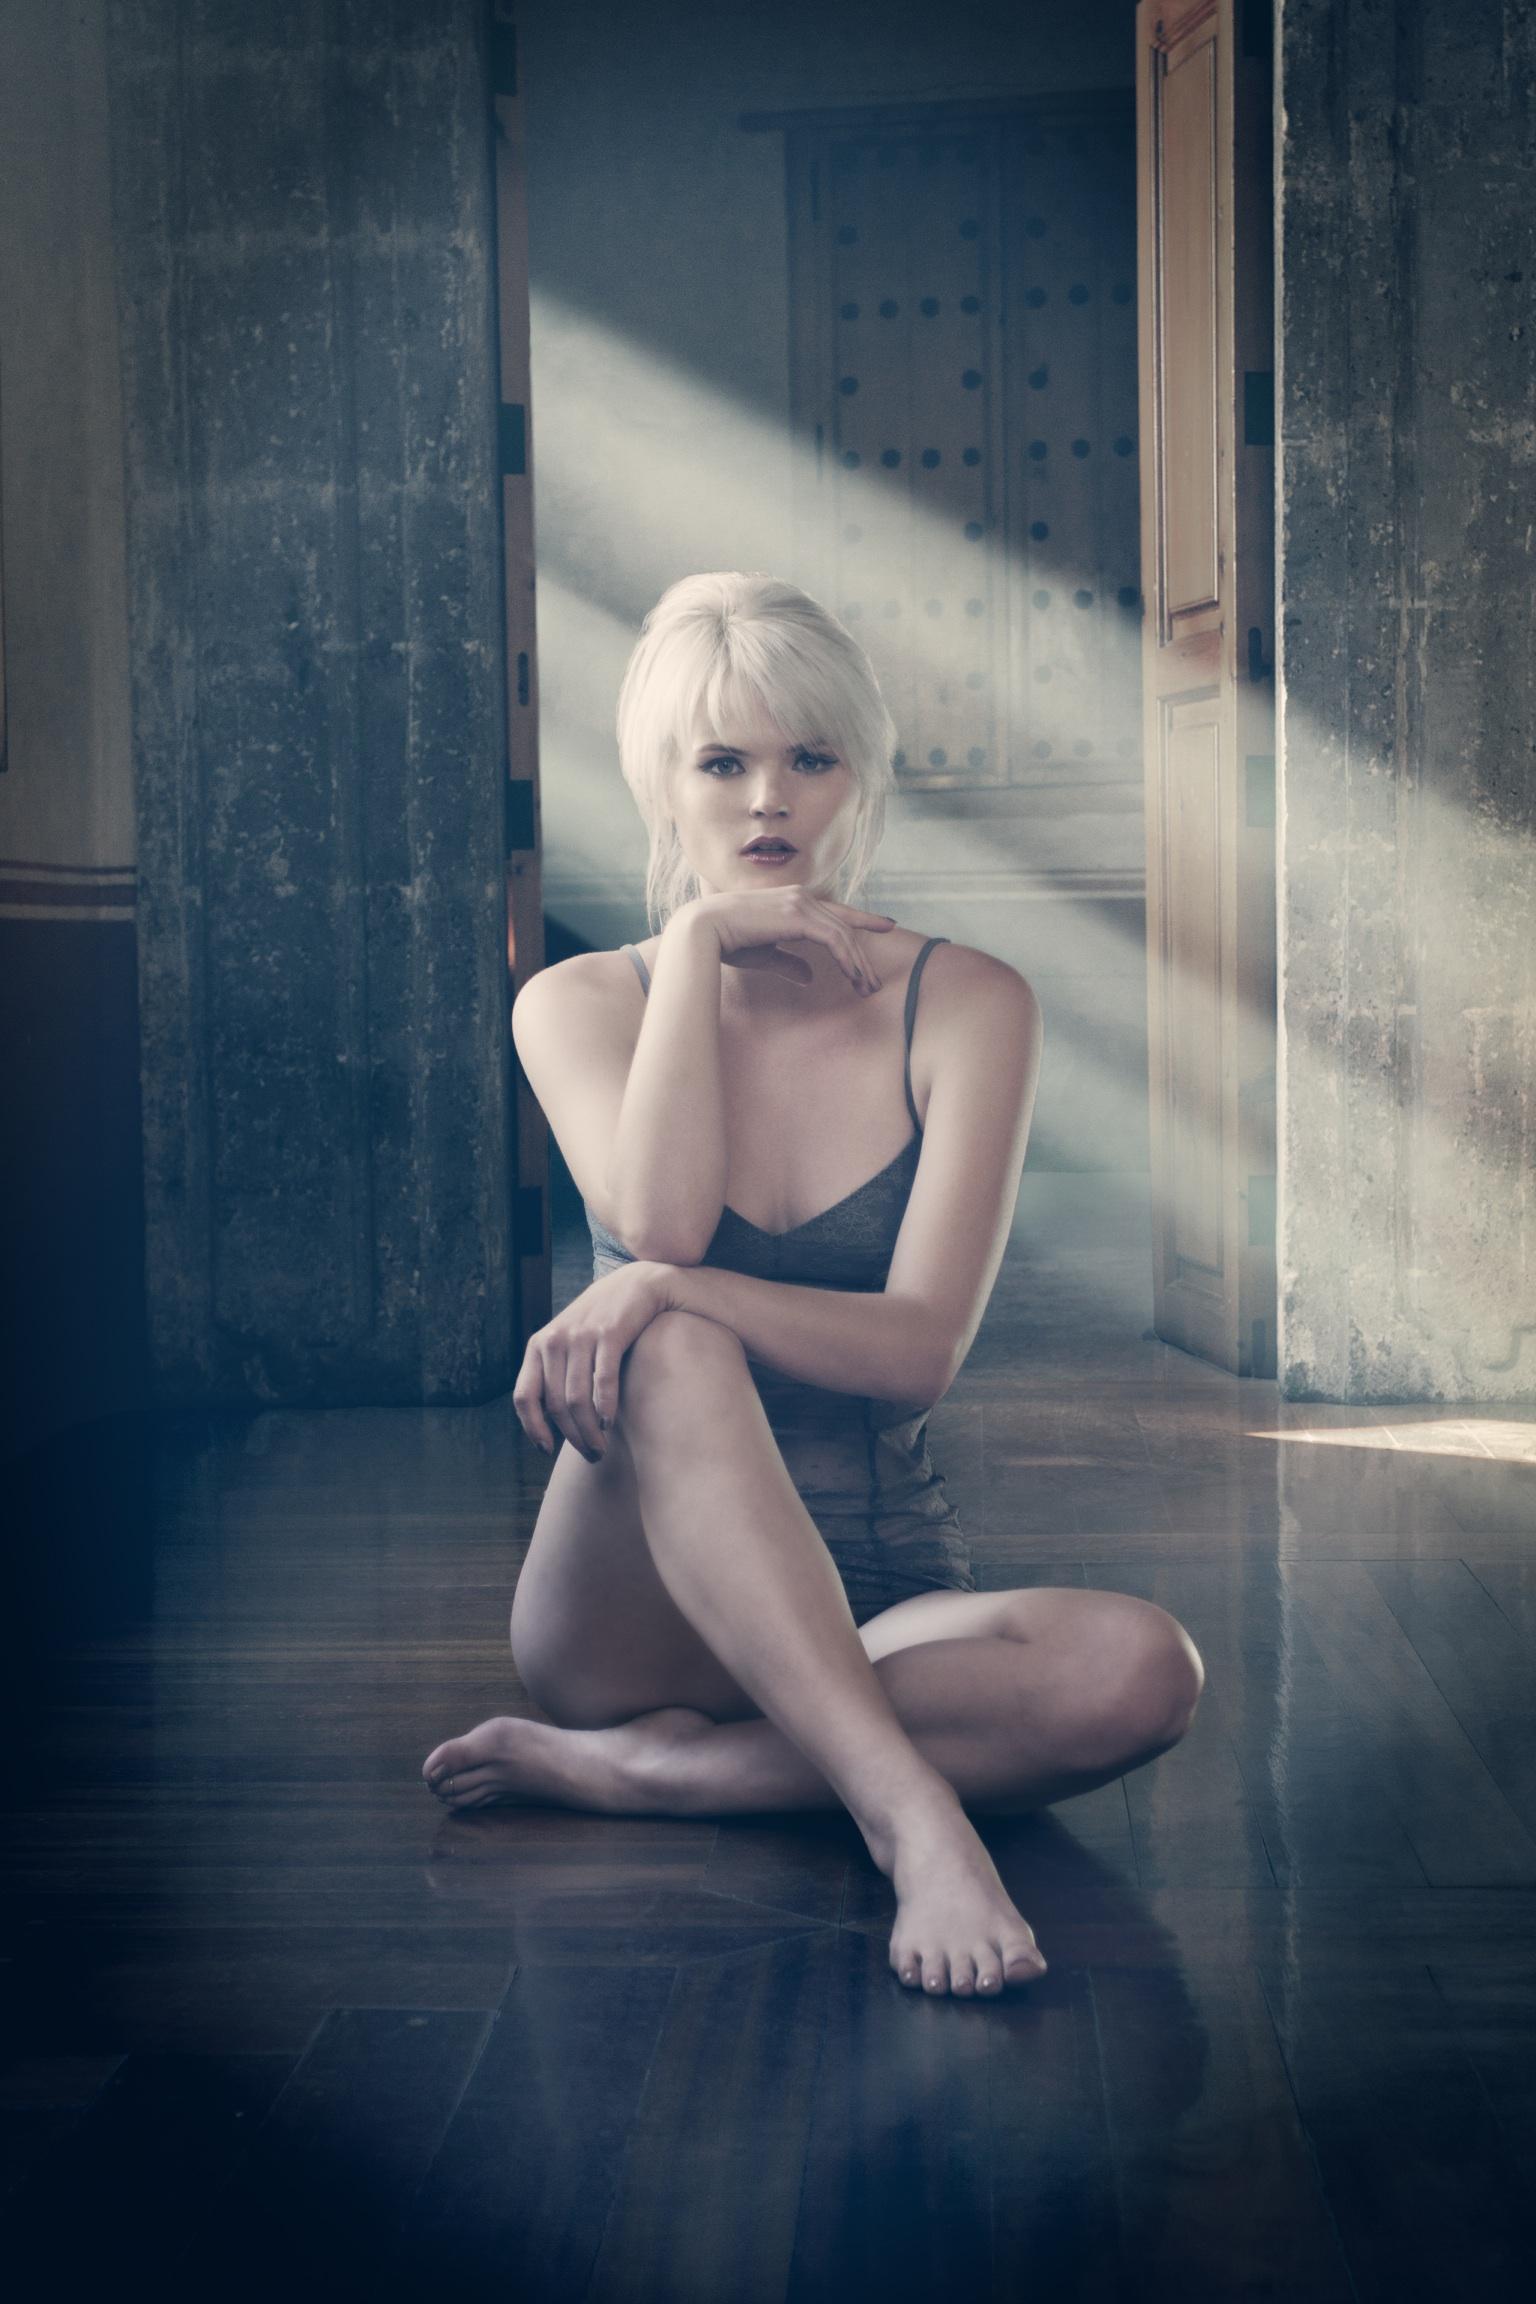 Paparazzi Julia Logacheva nude (42 photos), Pussy, Fappening, Feet, swimsuit 2020